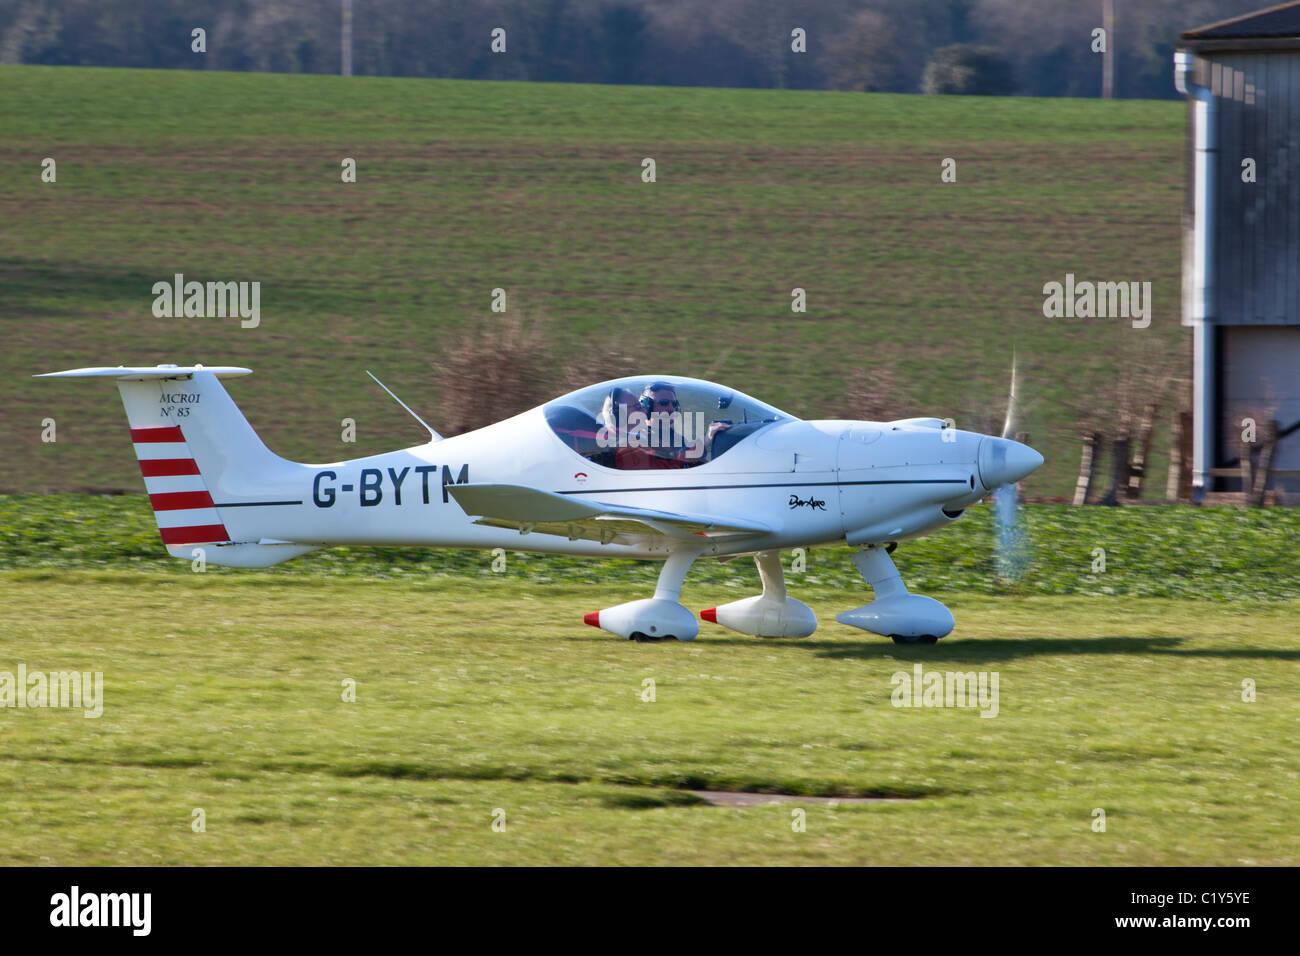 DynAero MCR-01 Banbi G-BYTM taxiing to the runway at Netherthorpe Airfield - Stock Image